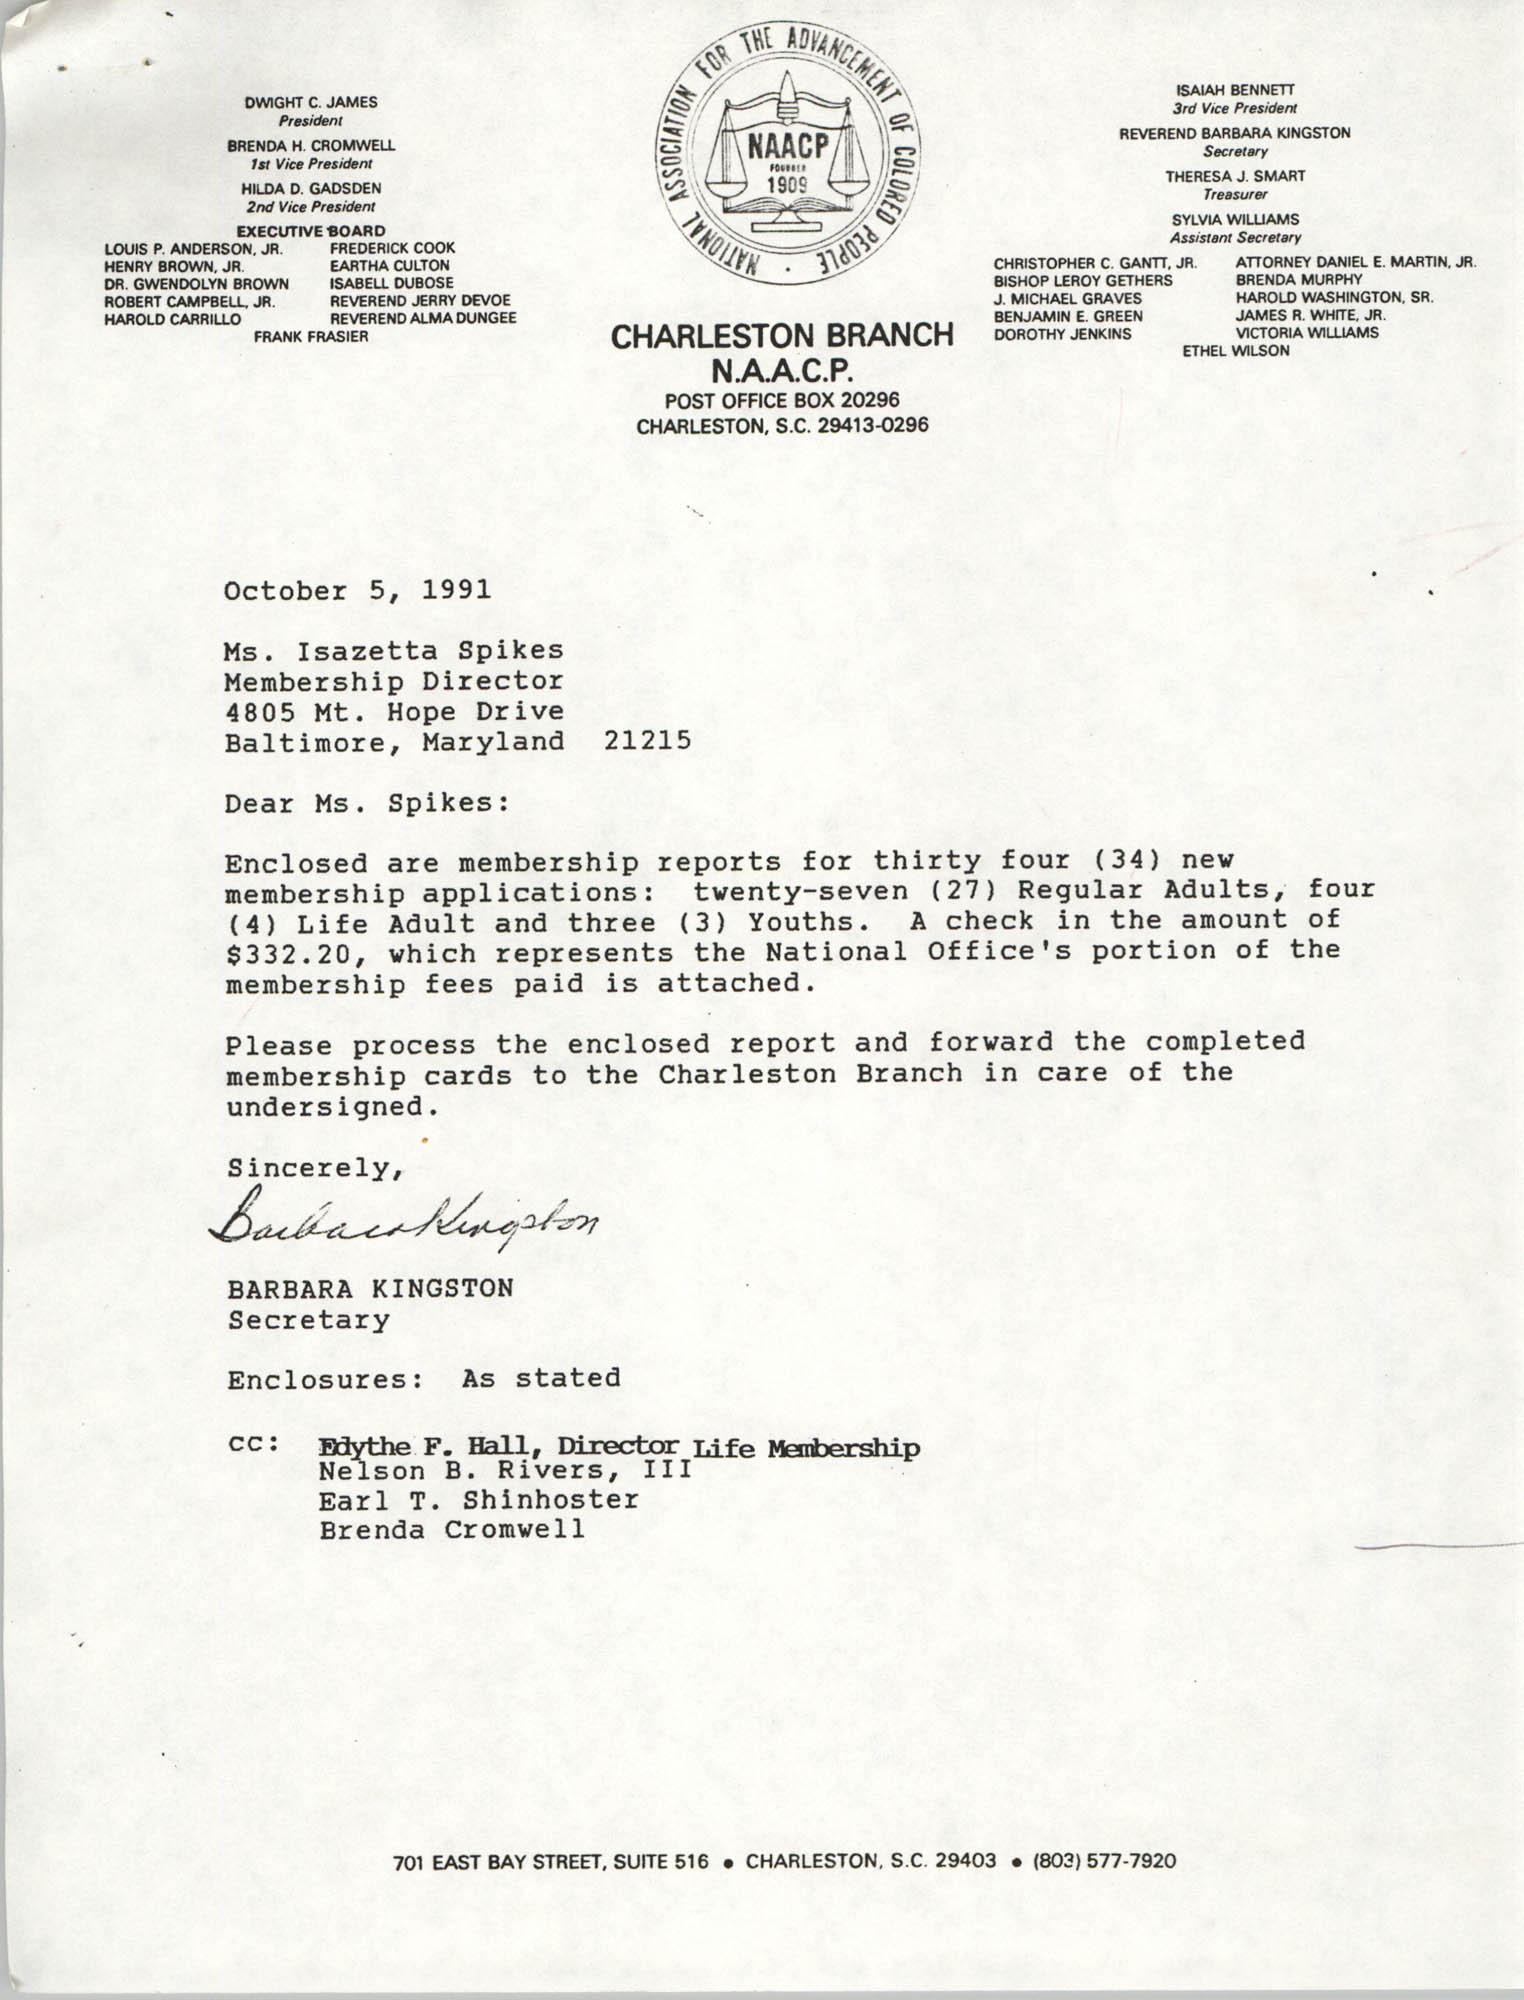 Letter from Barbara Kingston to Isazetta Spikes, October 5, 1991